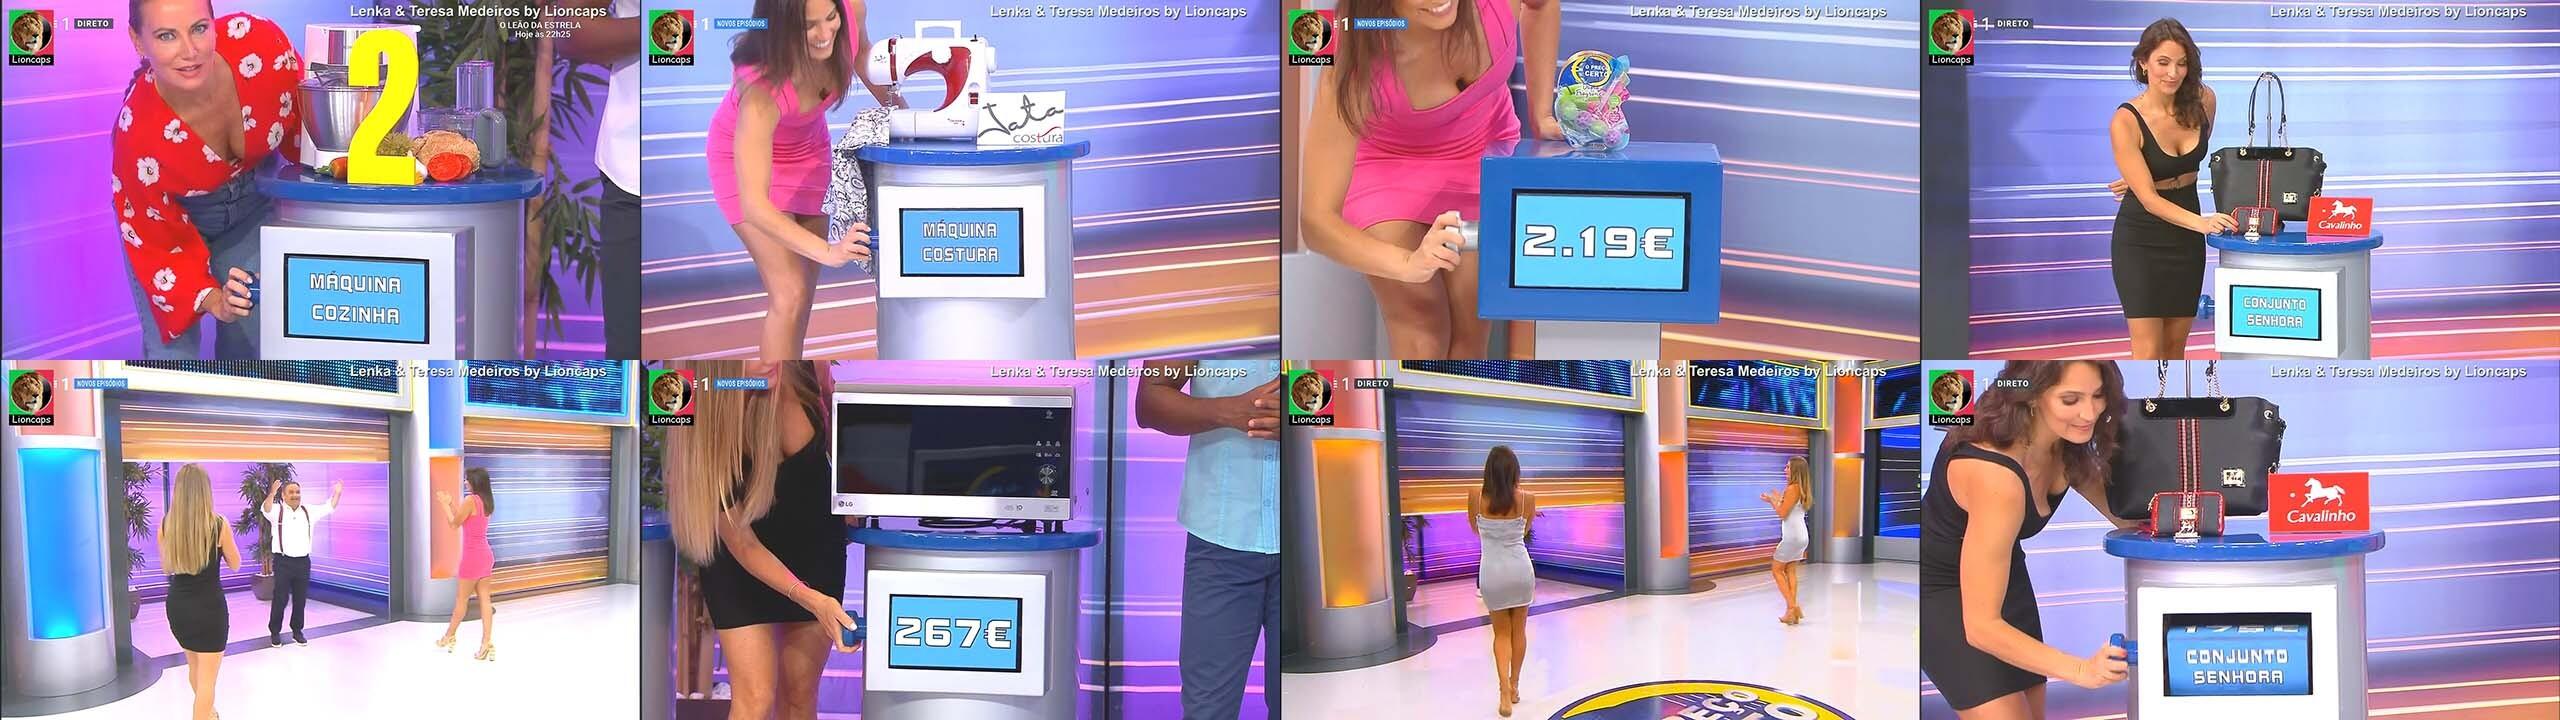 lenka_teresa_medeiros_preco_certo_lioncaps_06_08_2020.jpg